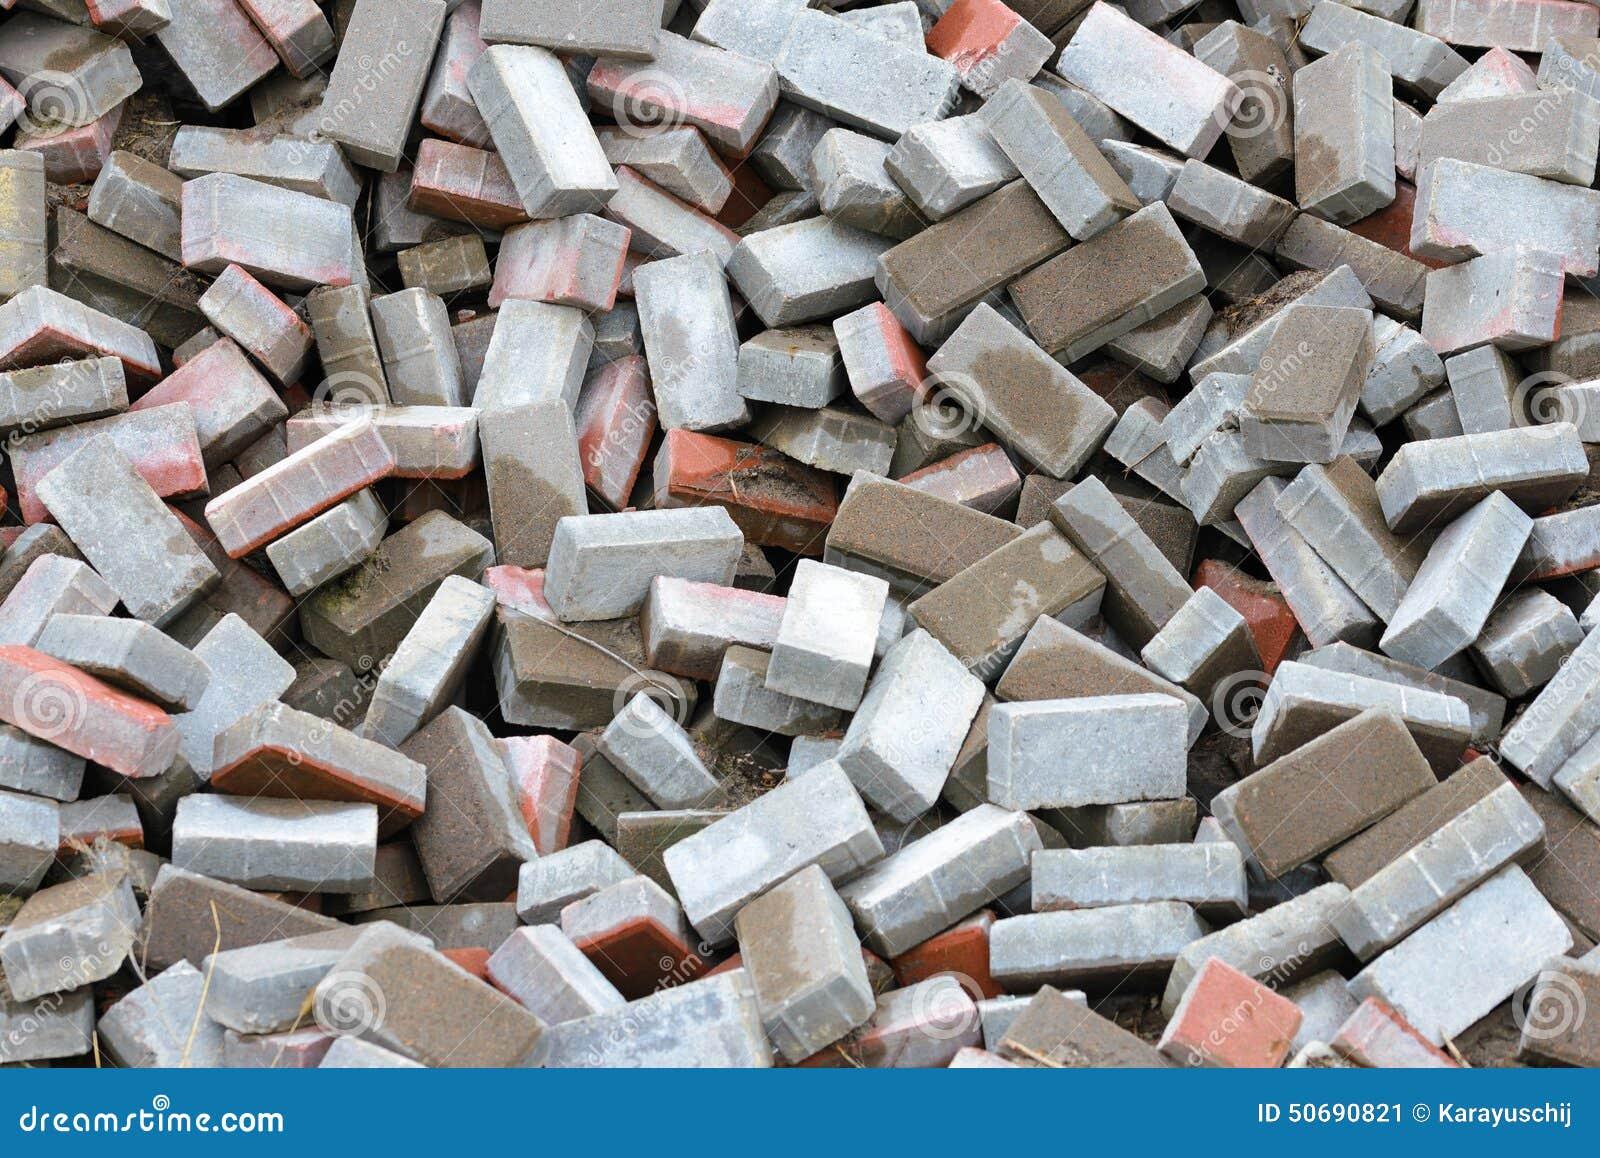 Calcium Silicate Brick : Heap of bricks stock photo image